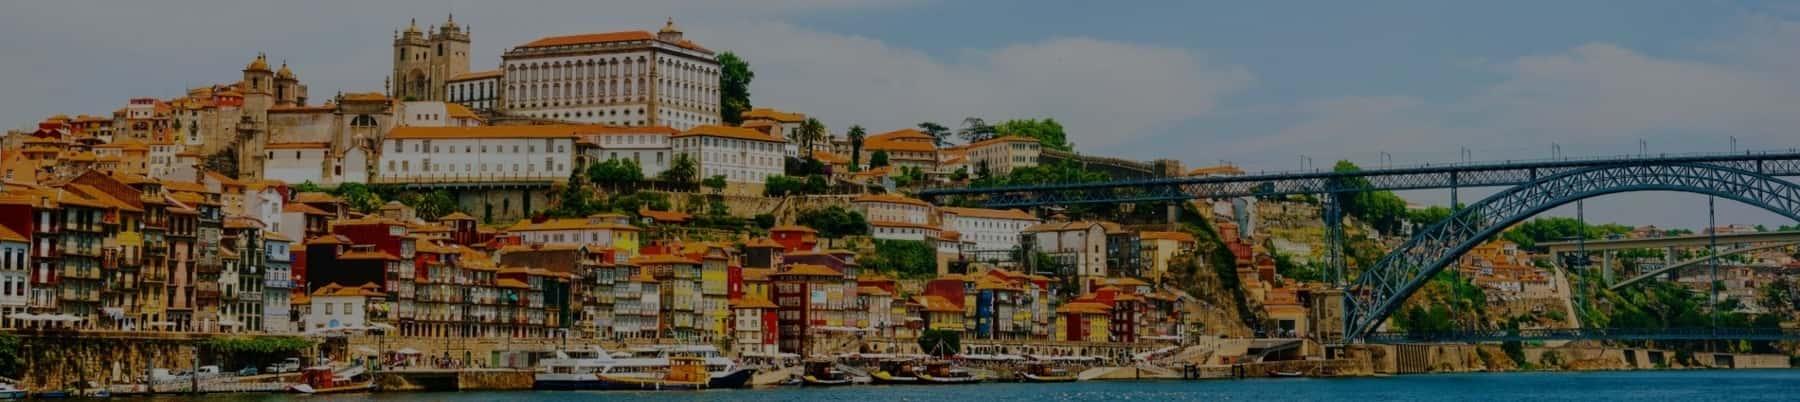 Portugal Real Estate